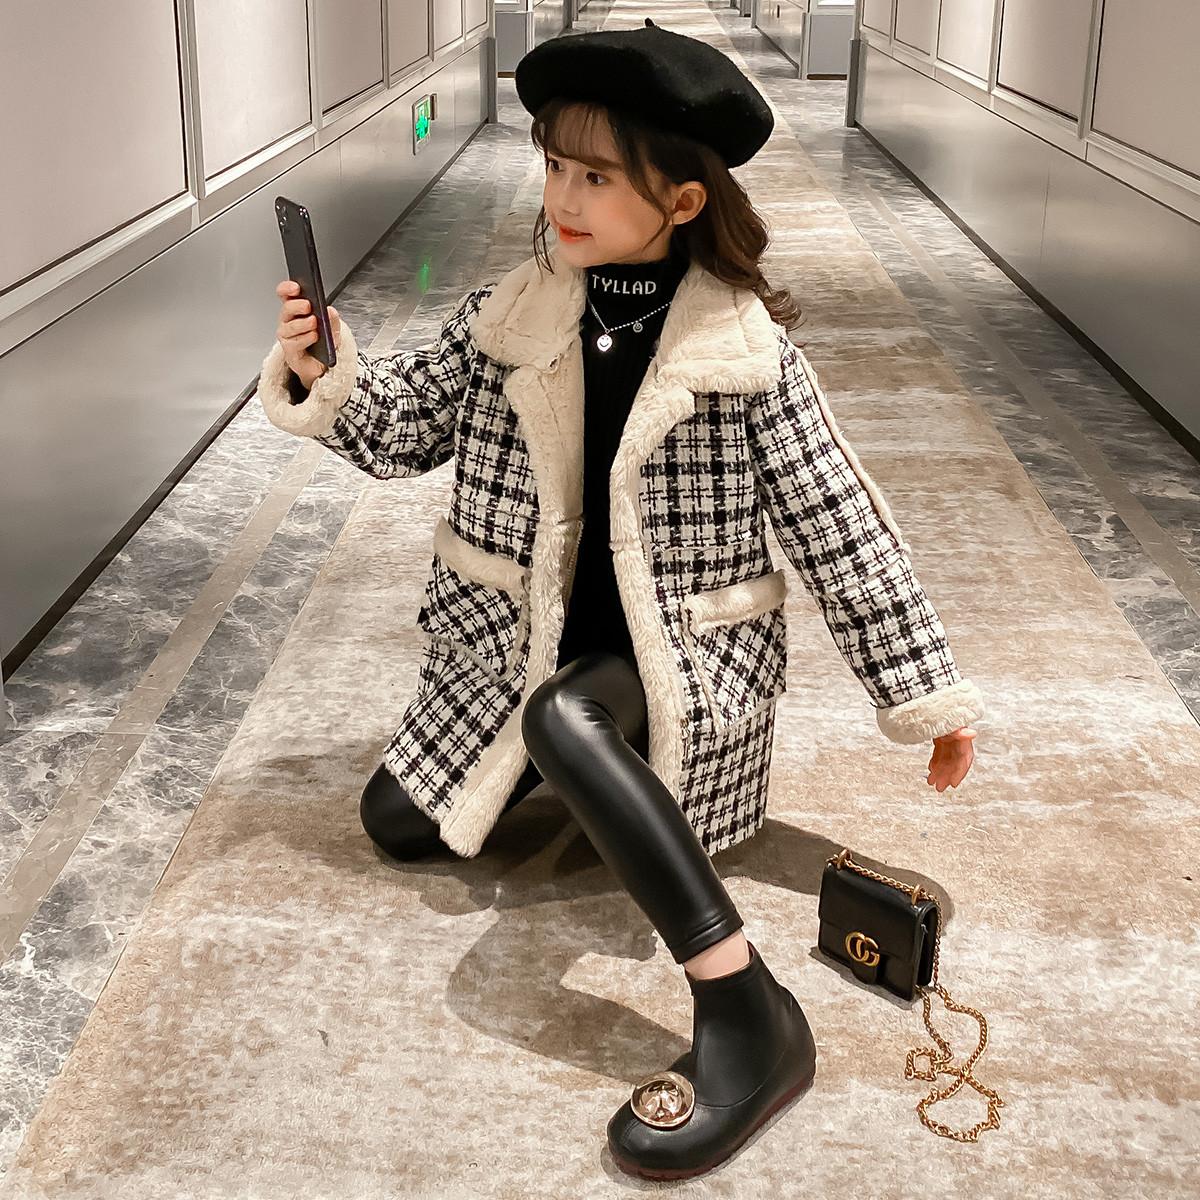 dme·kids德玛纳童装冬季新款女大童女童儿童撞色格纹中长款保暖外套Q534450485033902